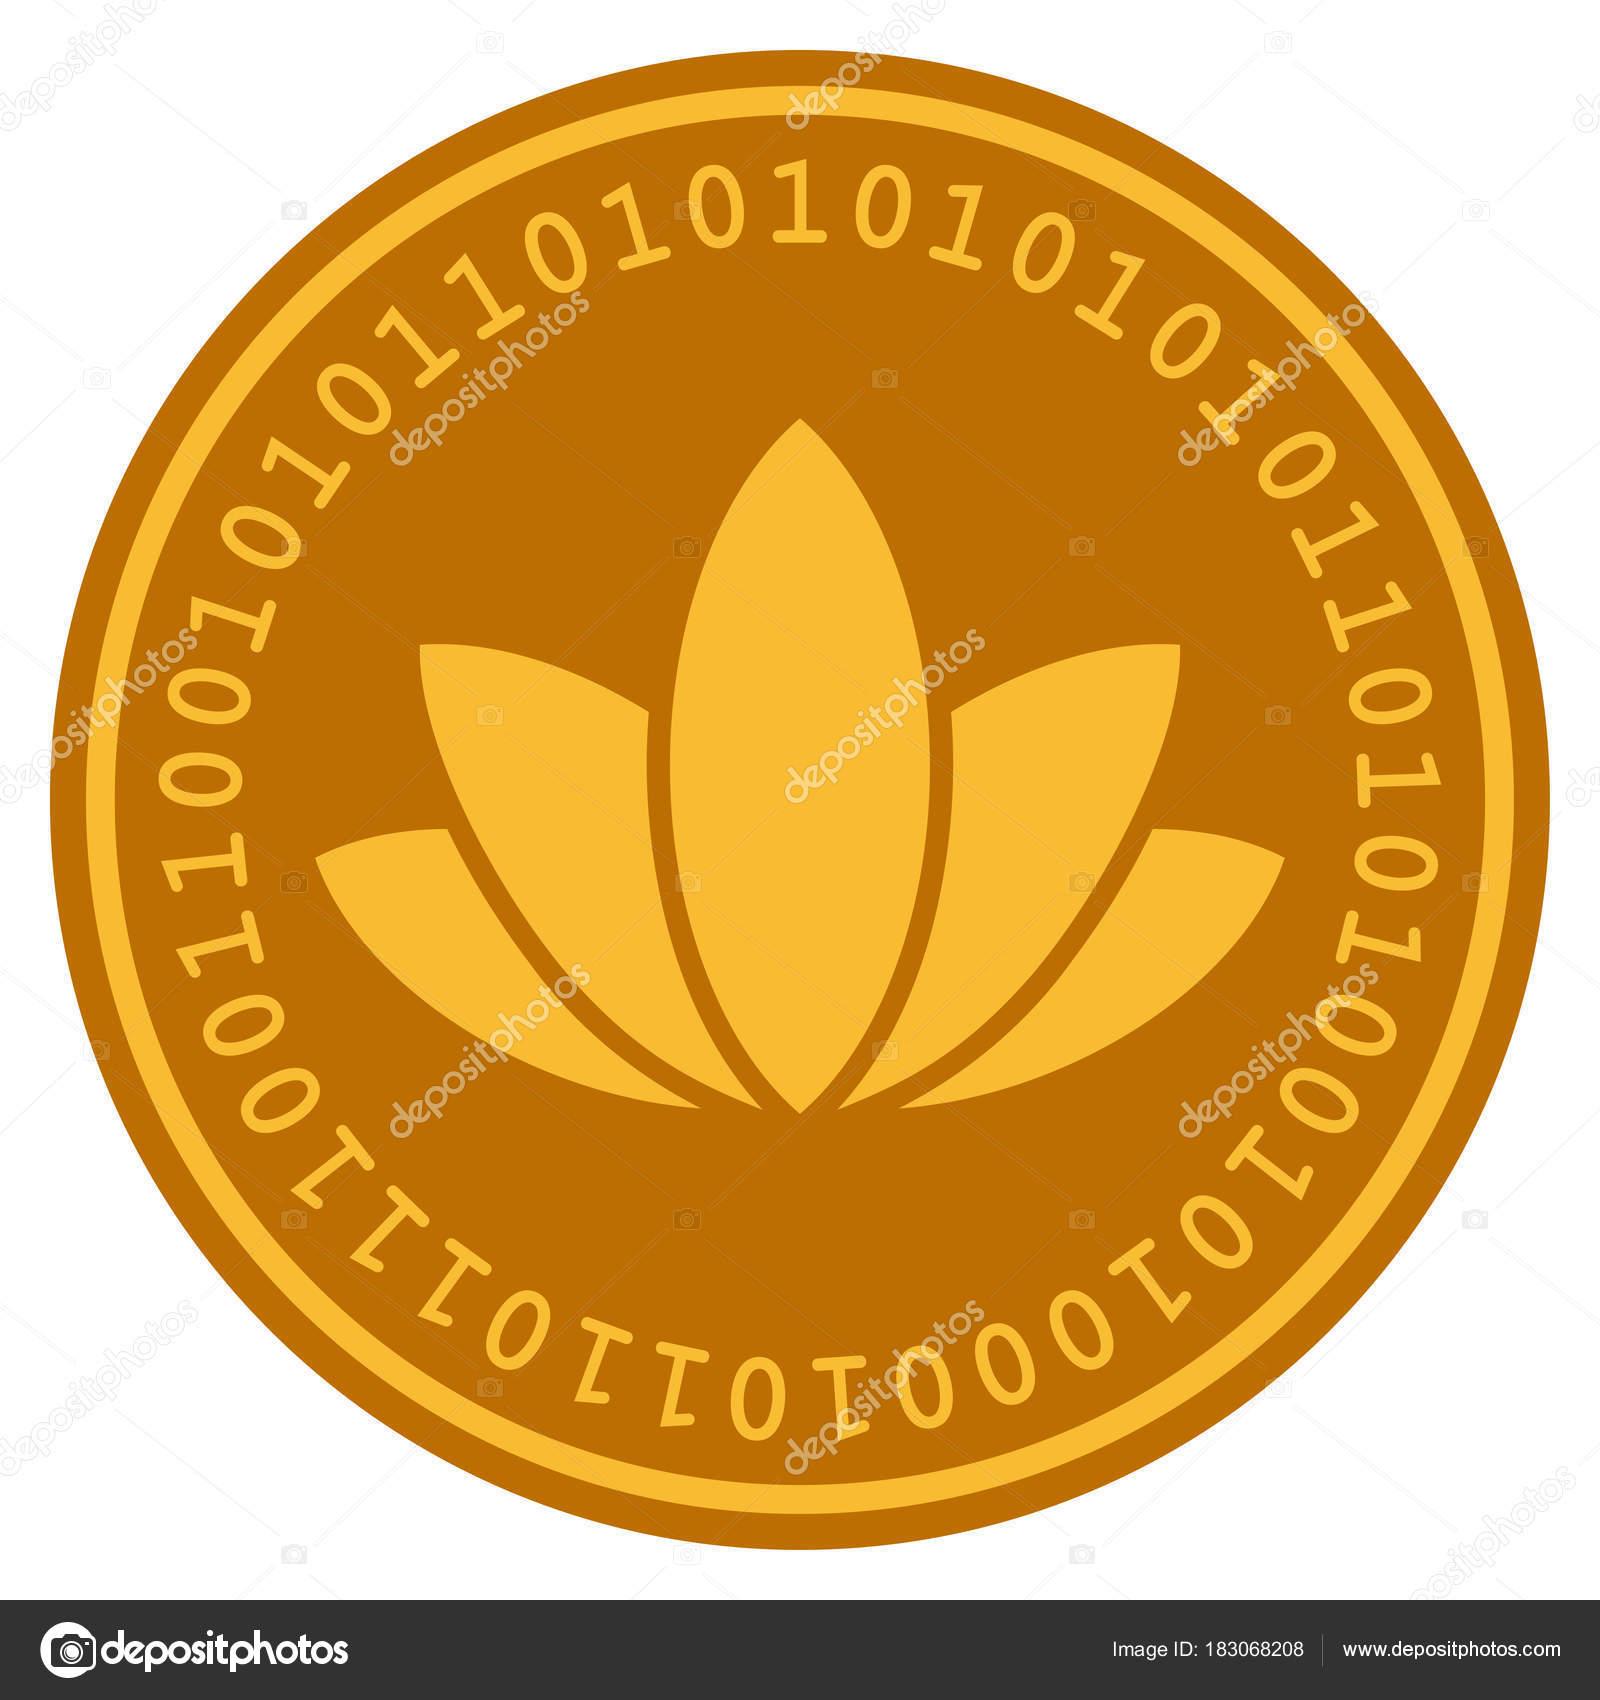 Lotus Flower Digital Coin Stock Vector Ahasoft 183068208